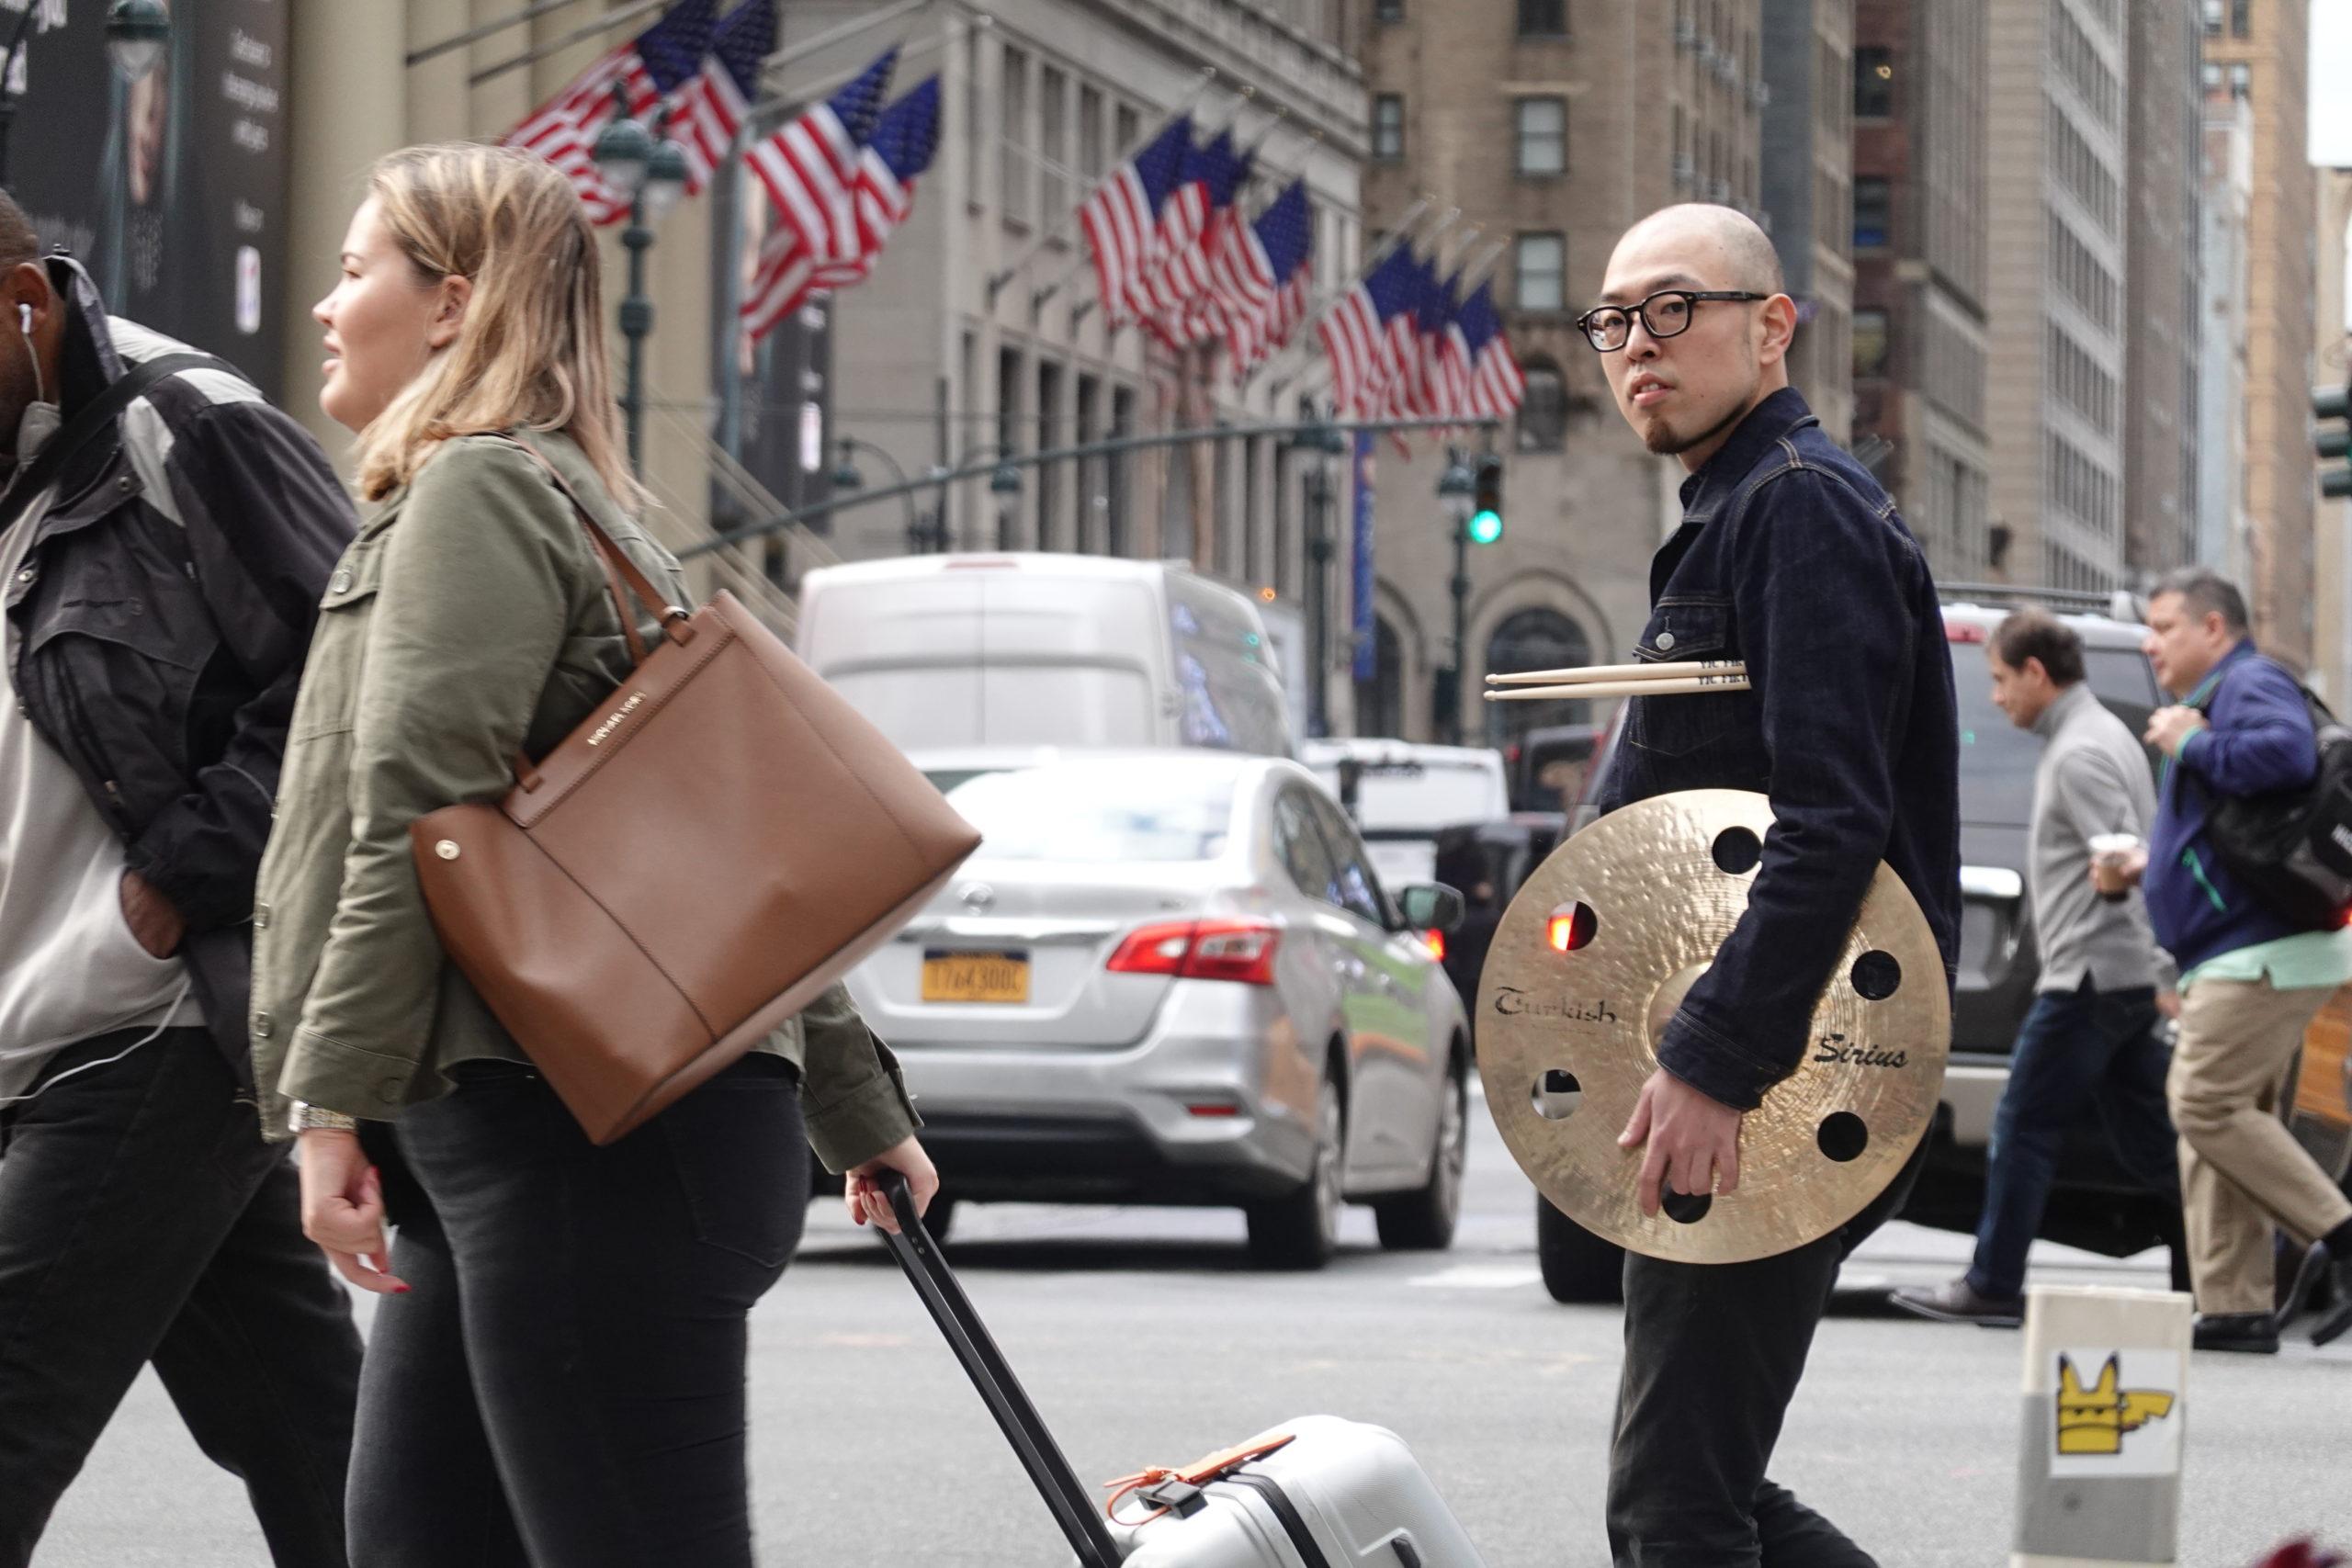 NY街中シンバル持って歩く